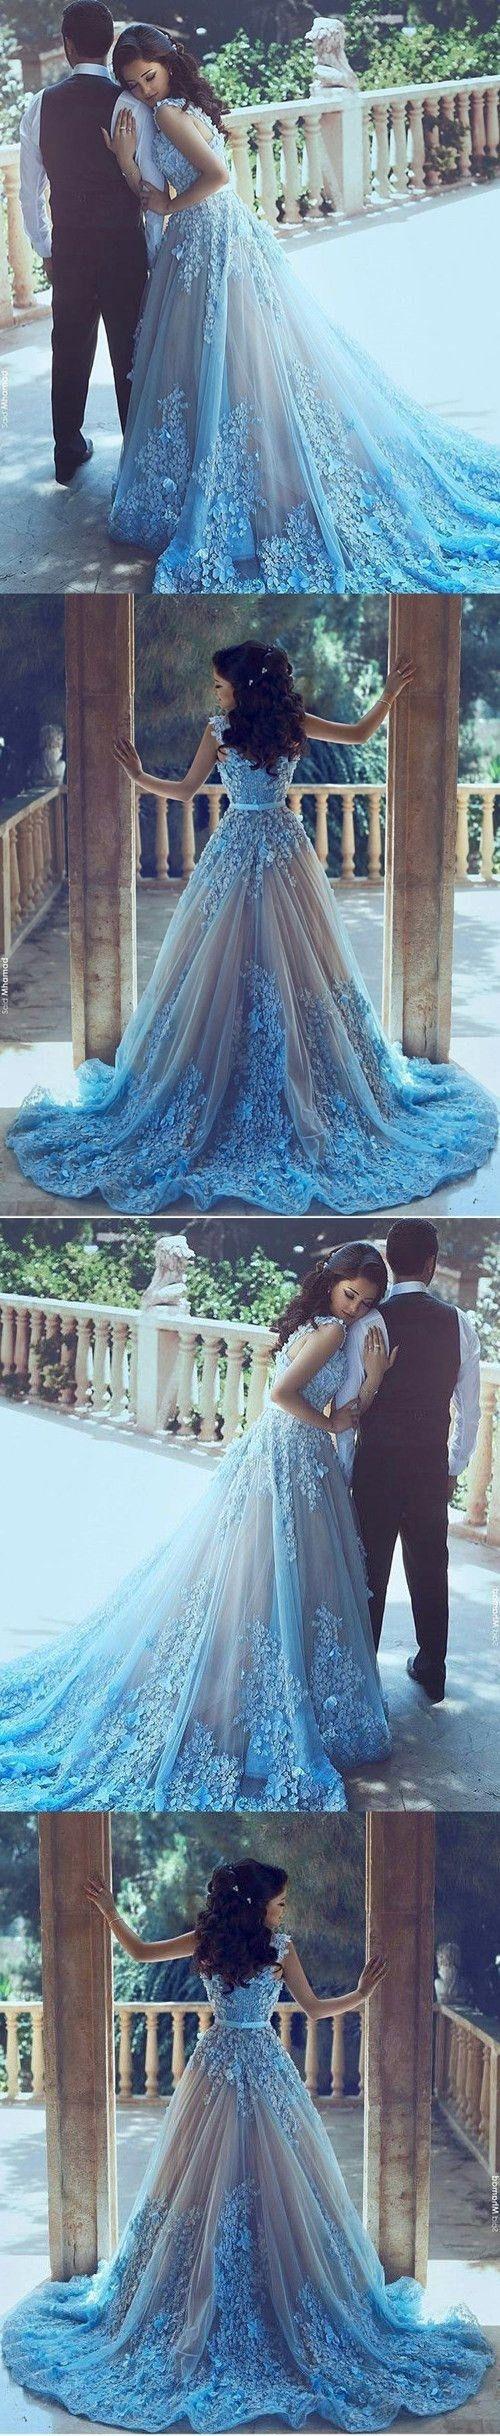 Aline sequare chapel train sleeveless blue tulle wedding dress with